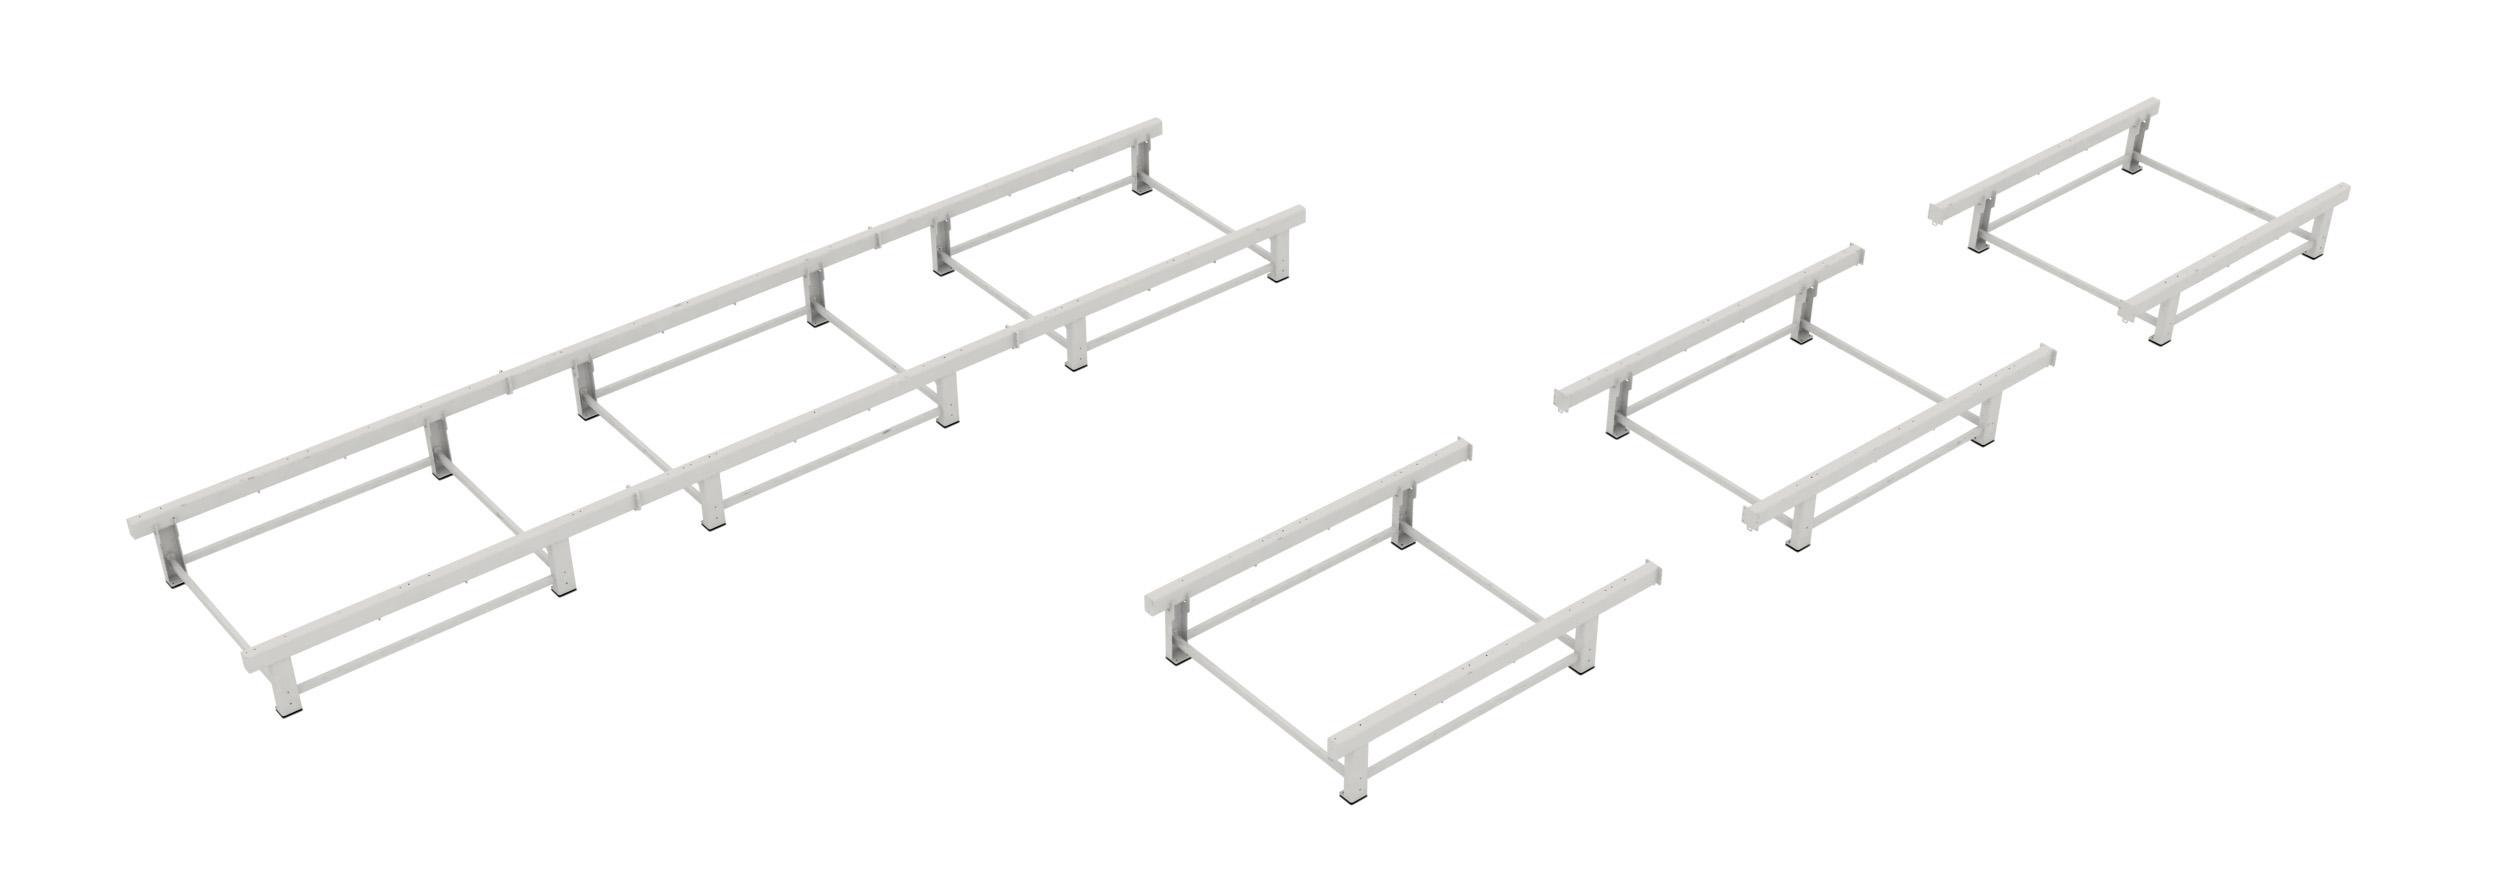 Soukup FRAMER Modular end modules plus center